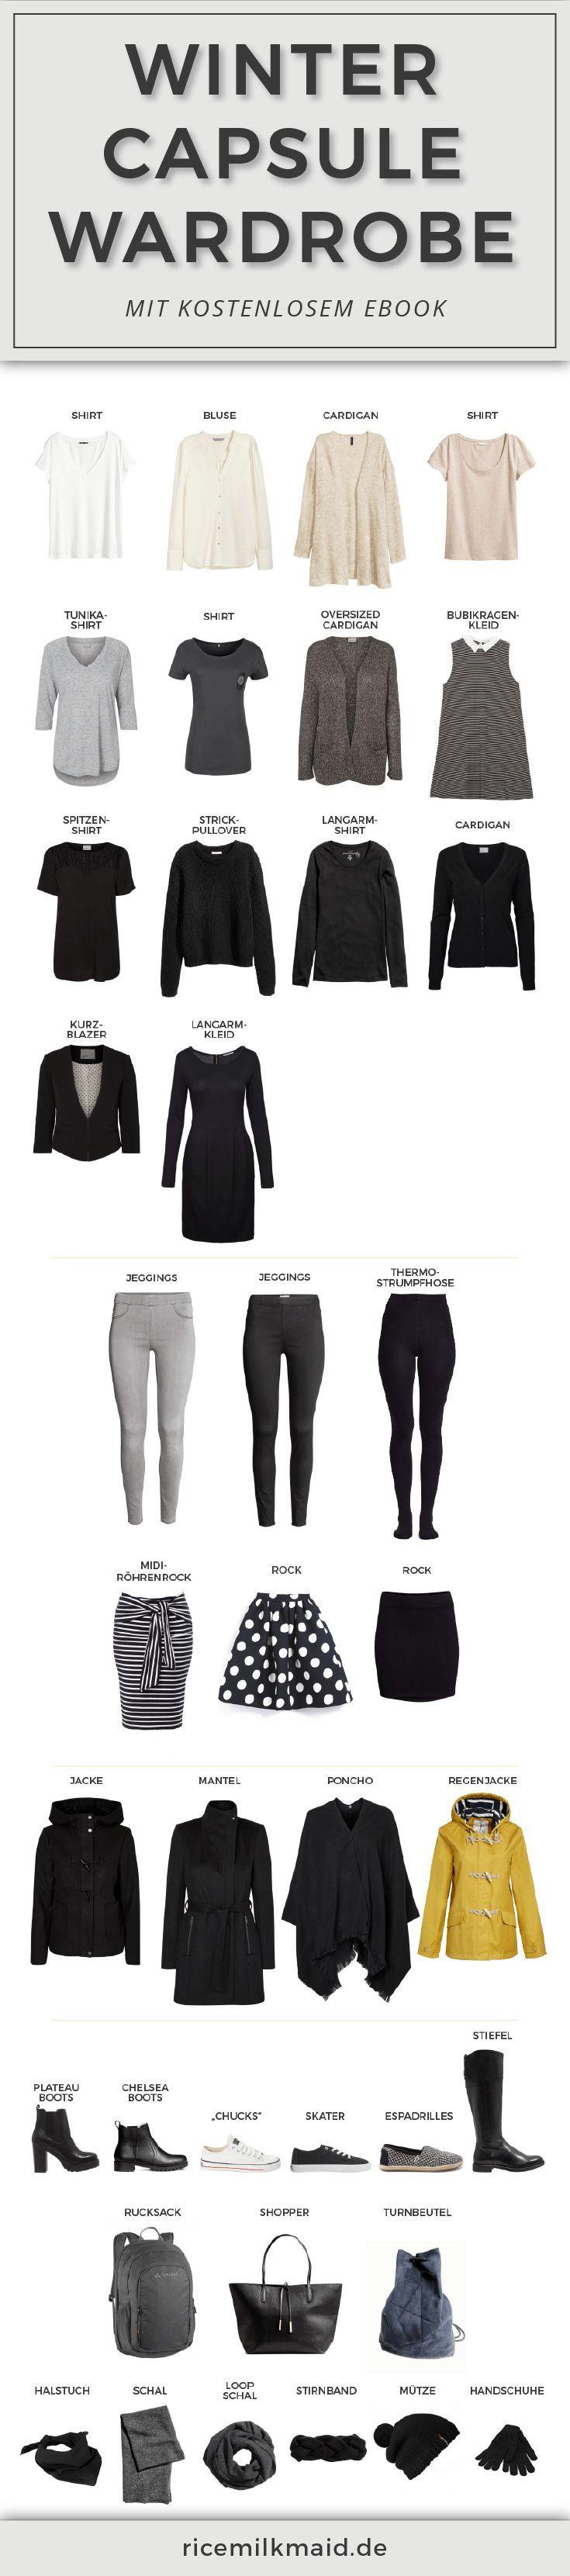 Capsule wardrobe f r den winter n hen capsule for Minimalistischer kleiderschrank